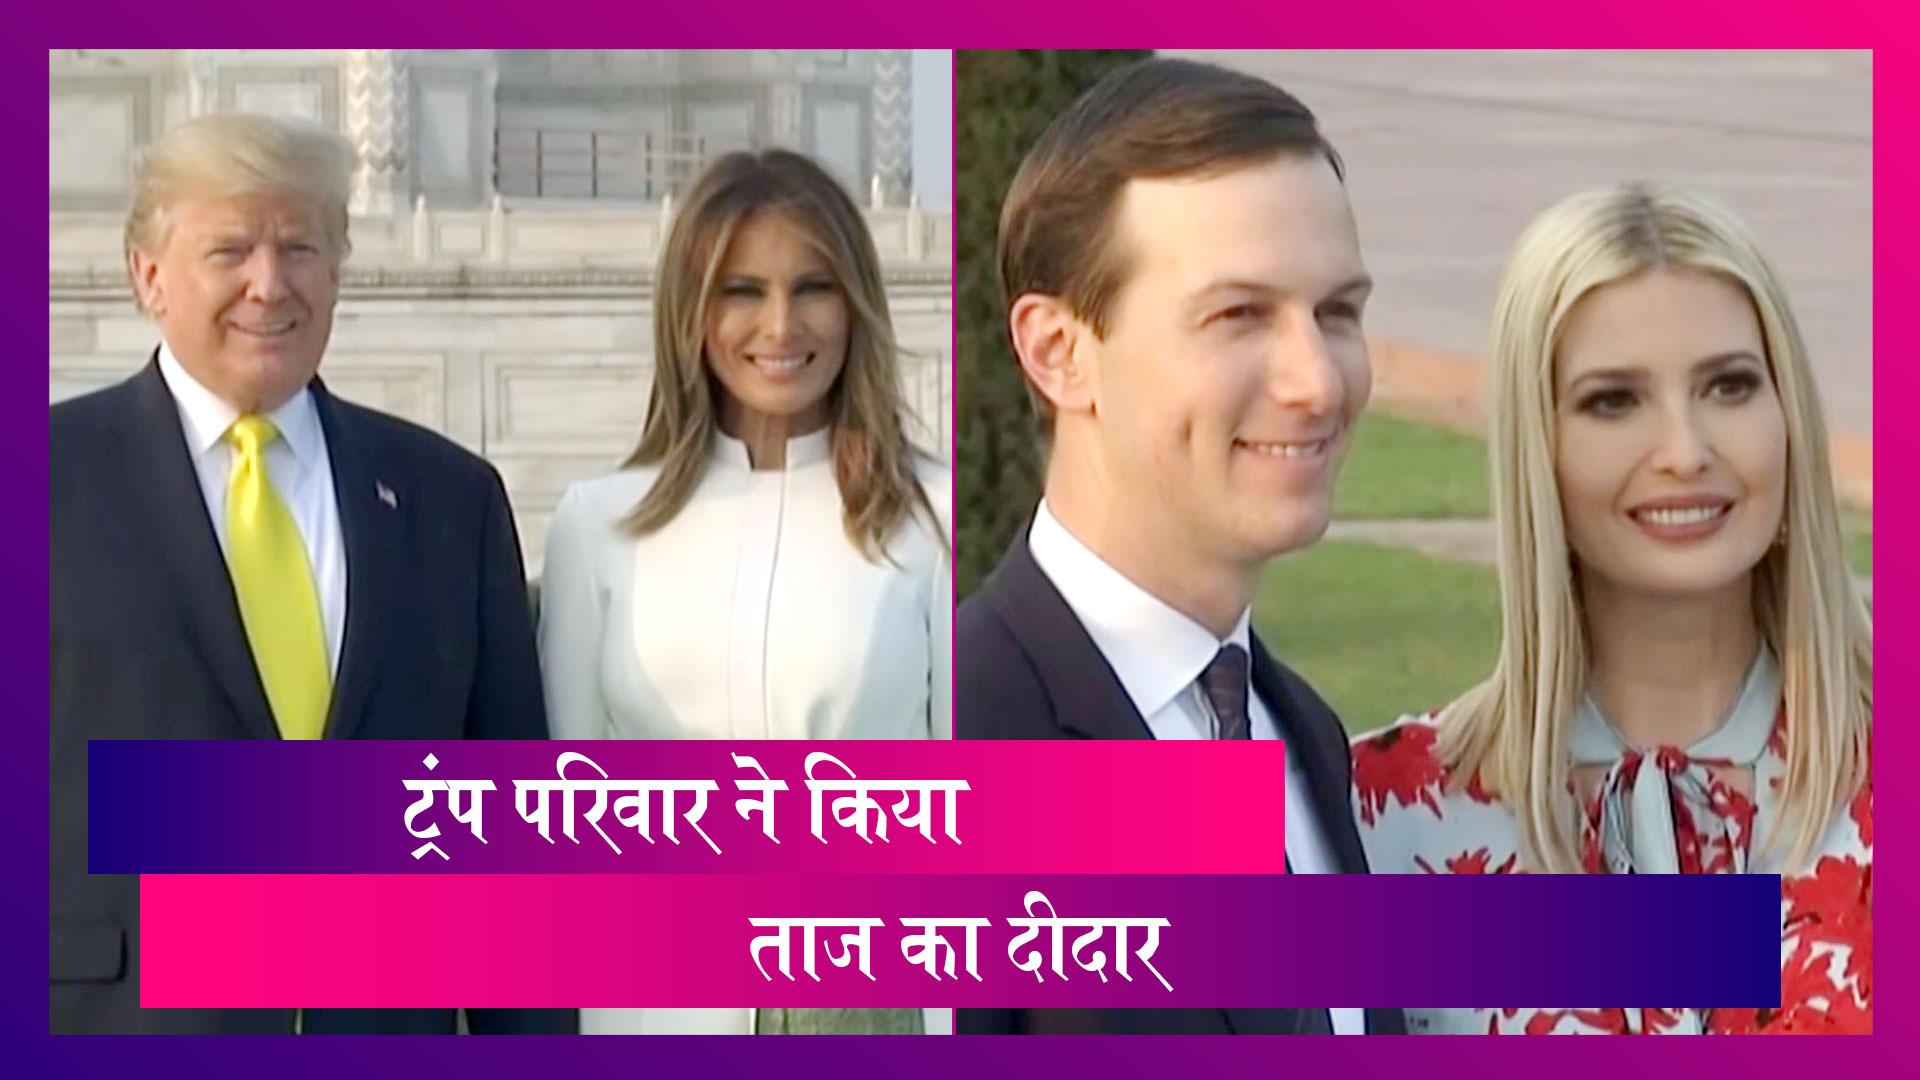 Donald Trump India Visit: Tajmahal के मुरीद हुए Donald और Melania Trump; Ivanka ने भी जाहिर की खुशी